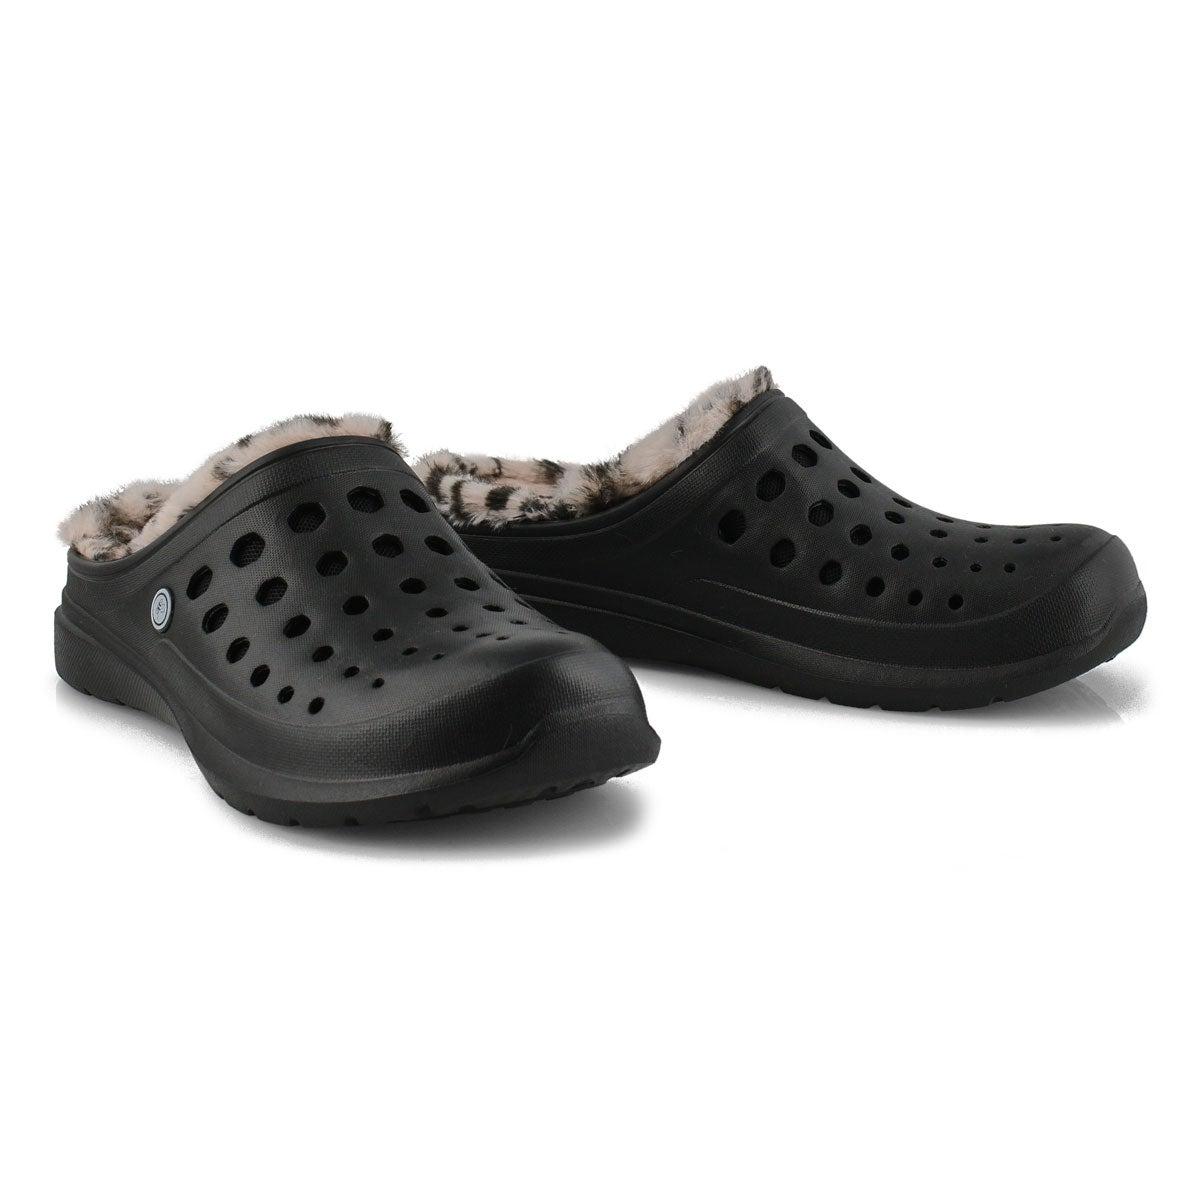 Unisex Uaslp Comfort Clog - Black/Cheetah